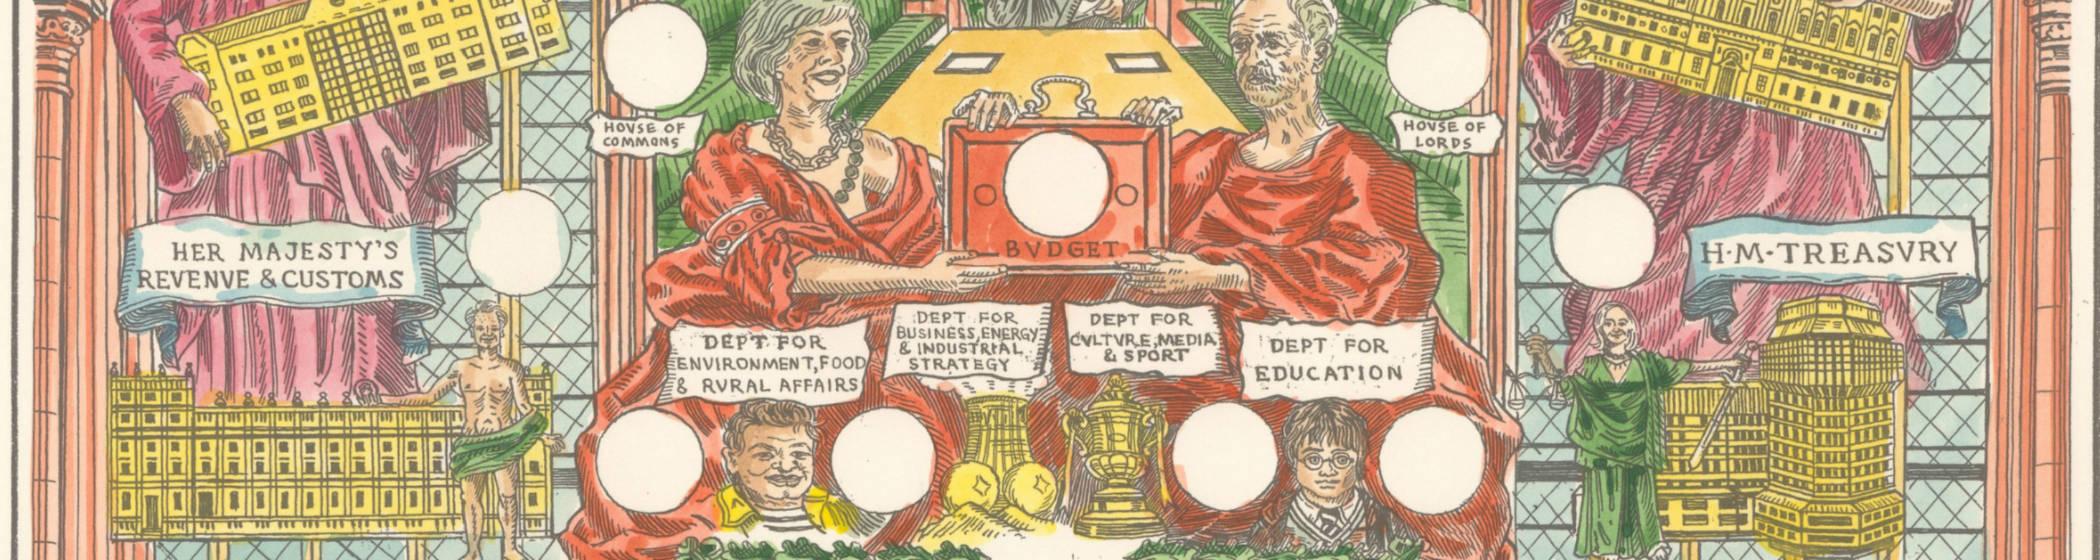 Almanac by British artists Adam Dant